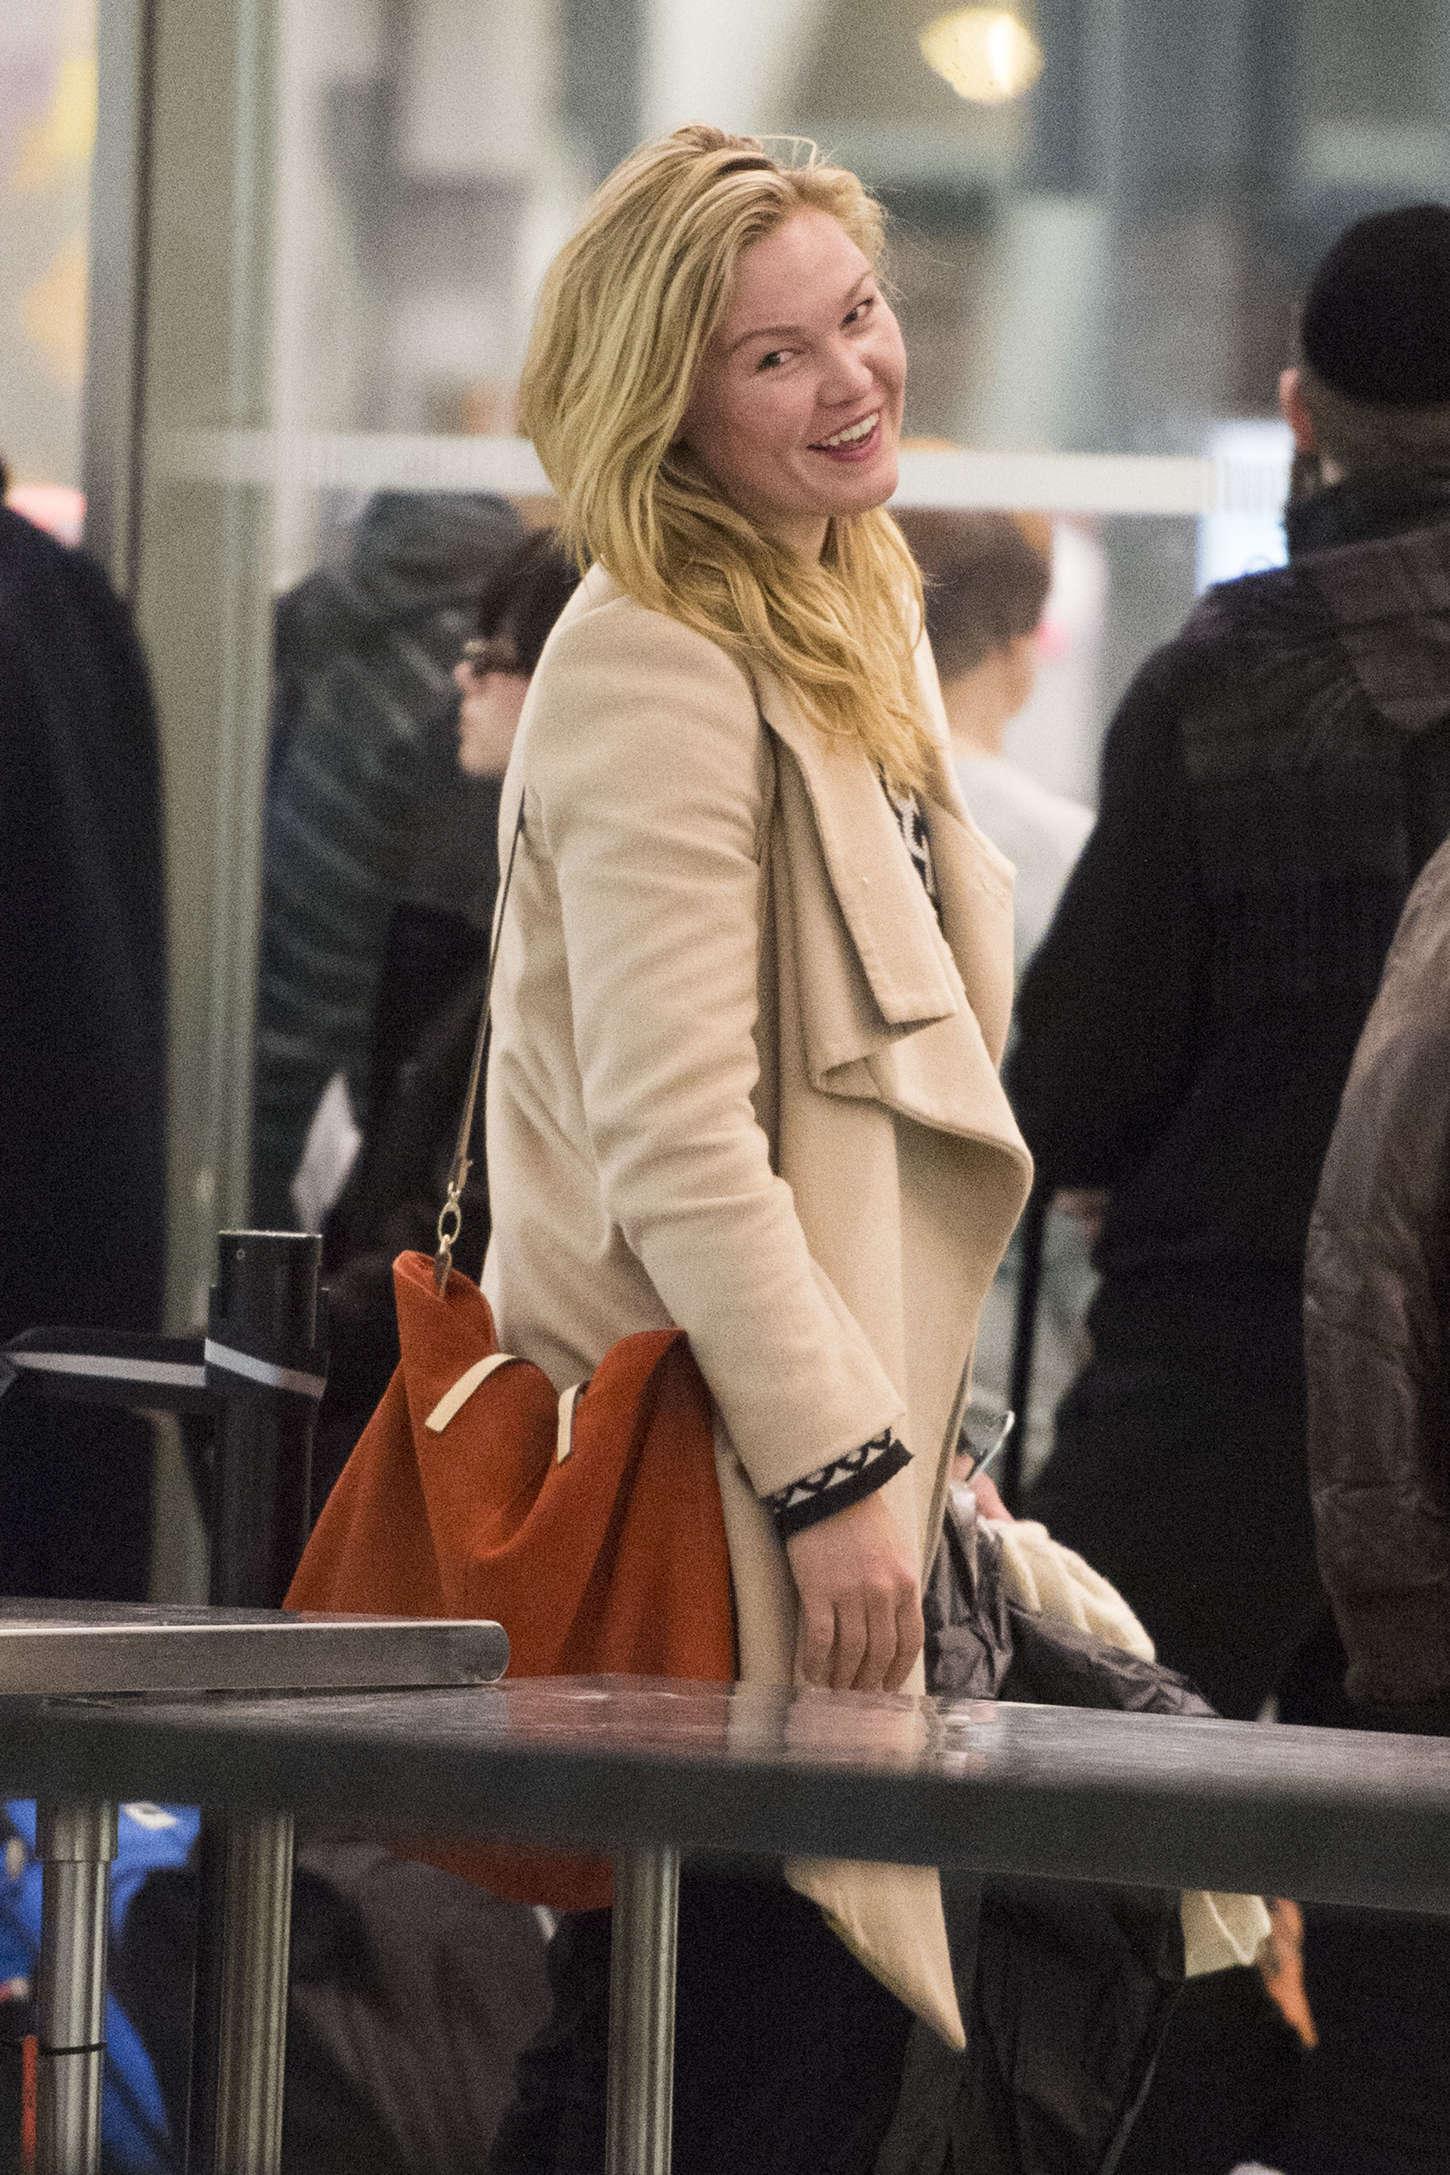 Julia Stiles - JFK Airport in NYC